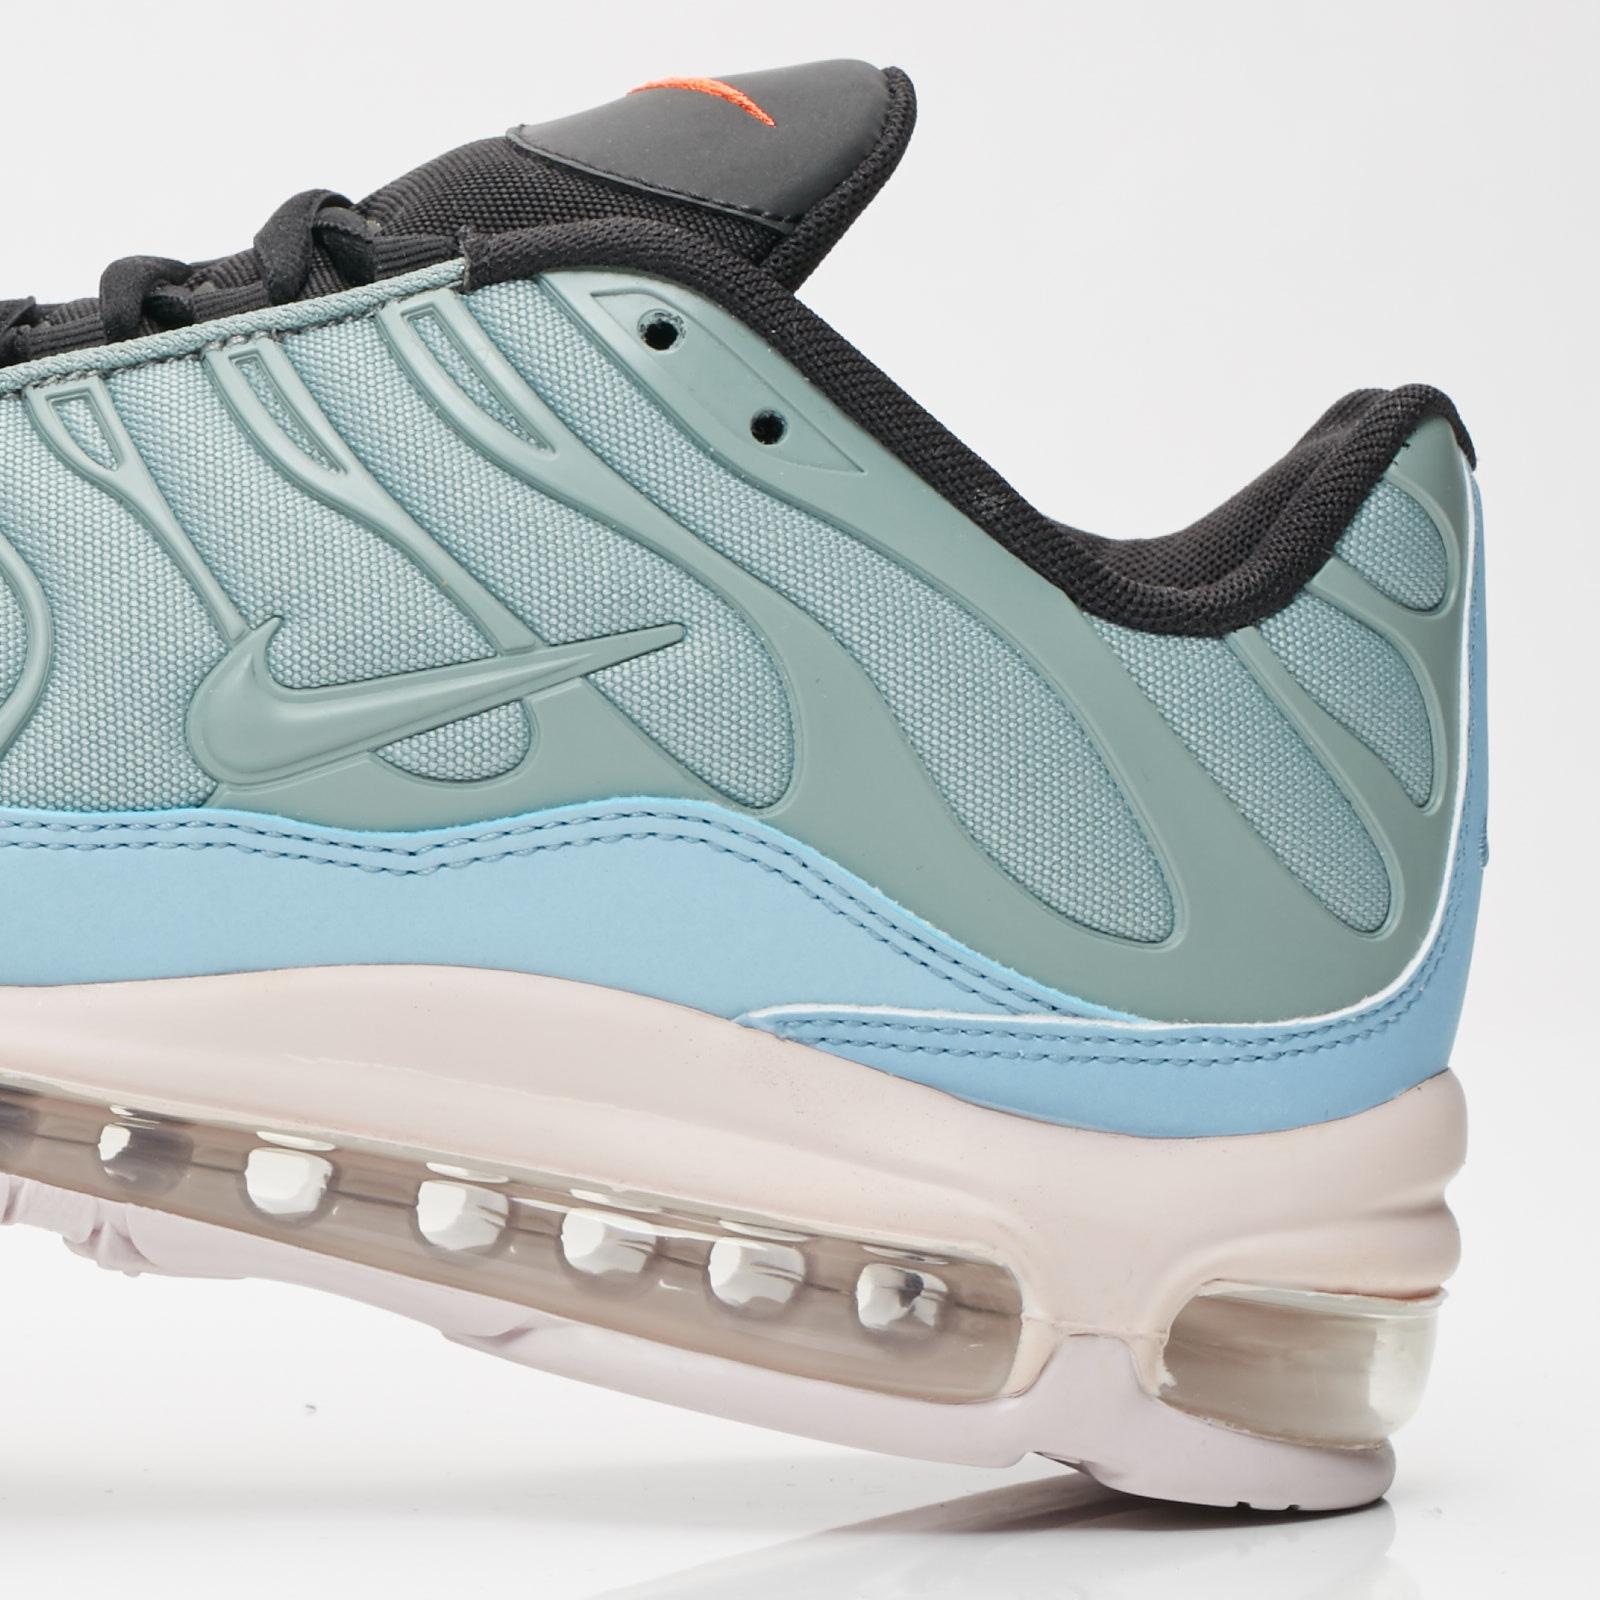 cdcfcc1788cc Nike Air Max 97   Plus - Ah8144-300 - Sneakersnstuff